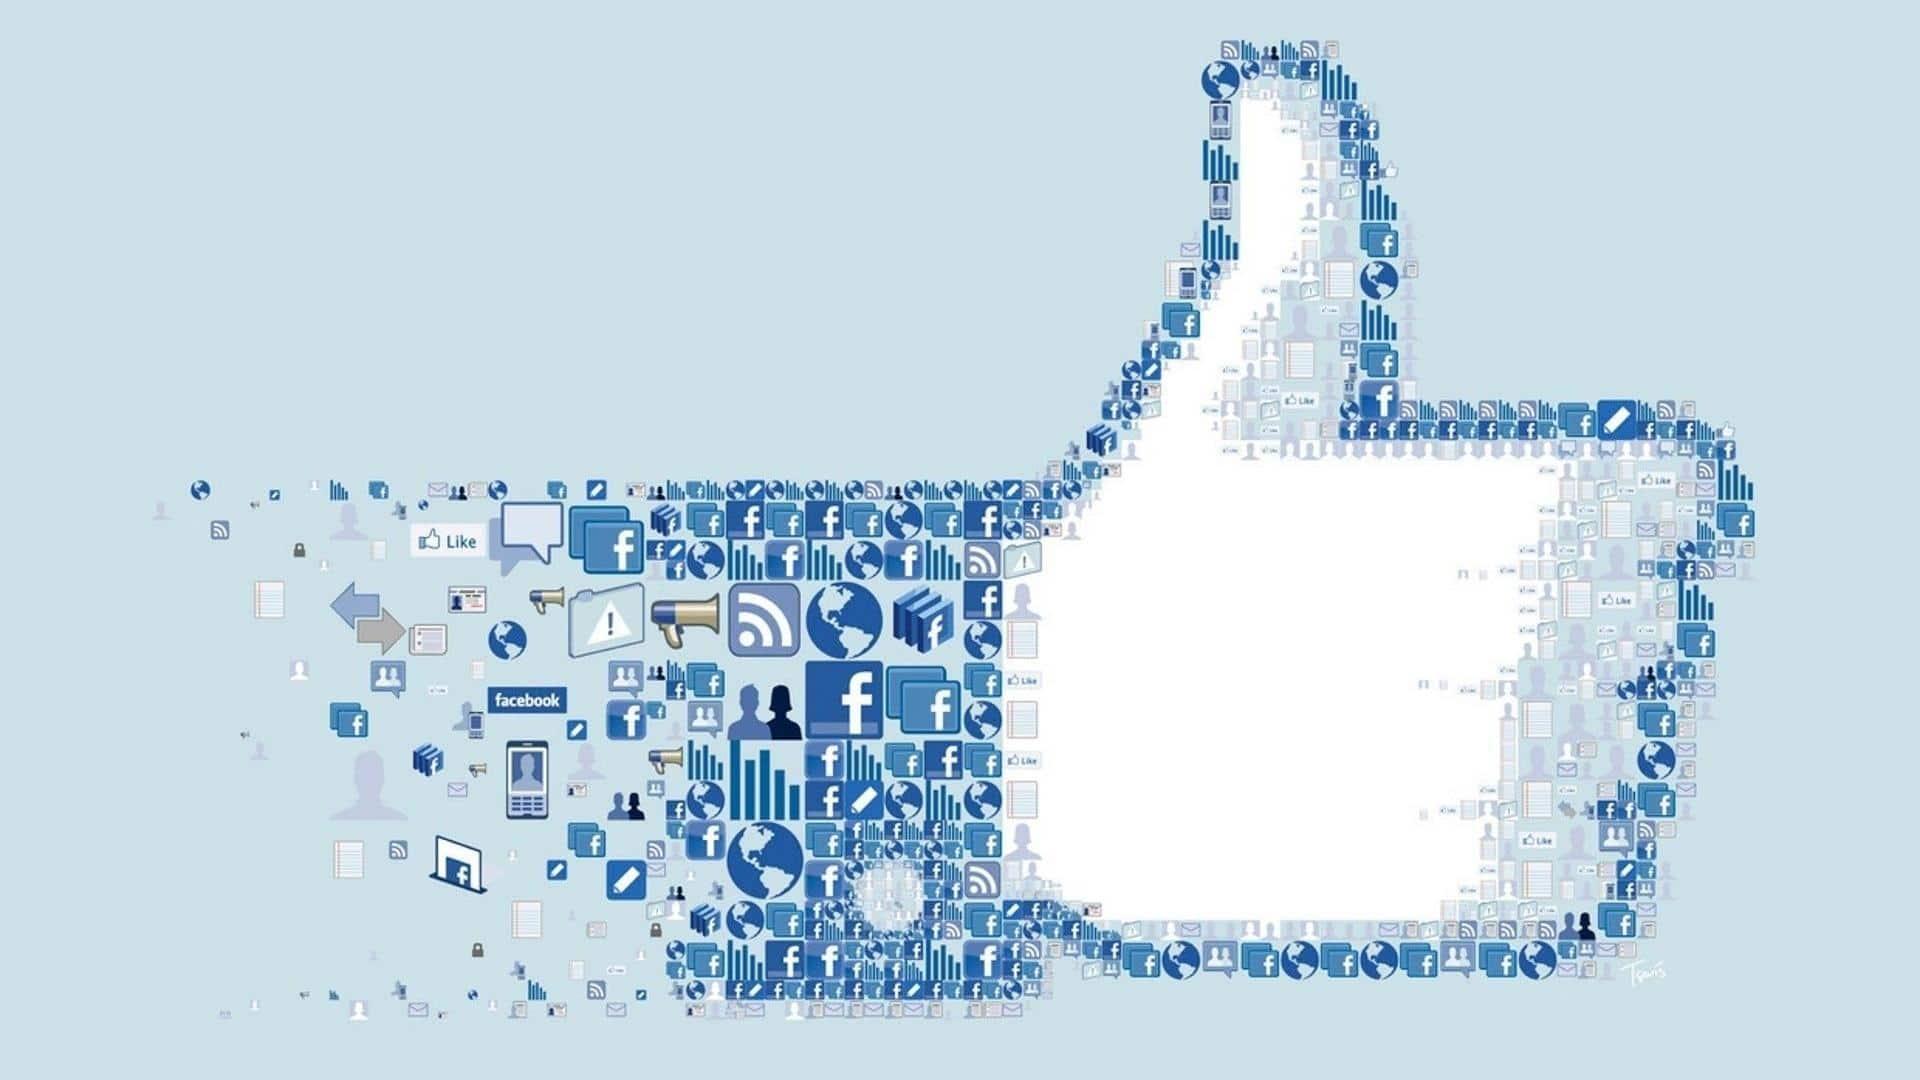 Beginner's Guide To Get More Facebook Likes For Wordpress Websites